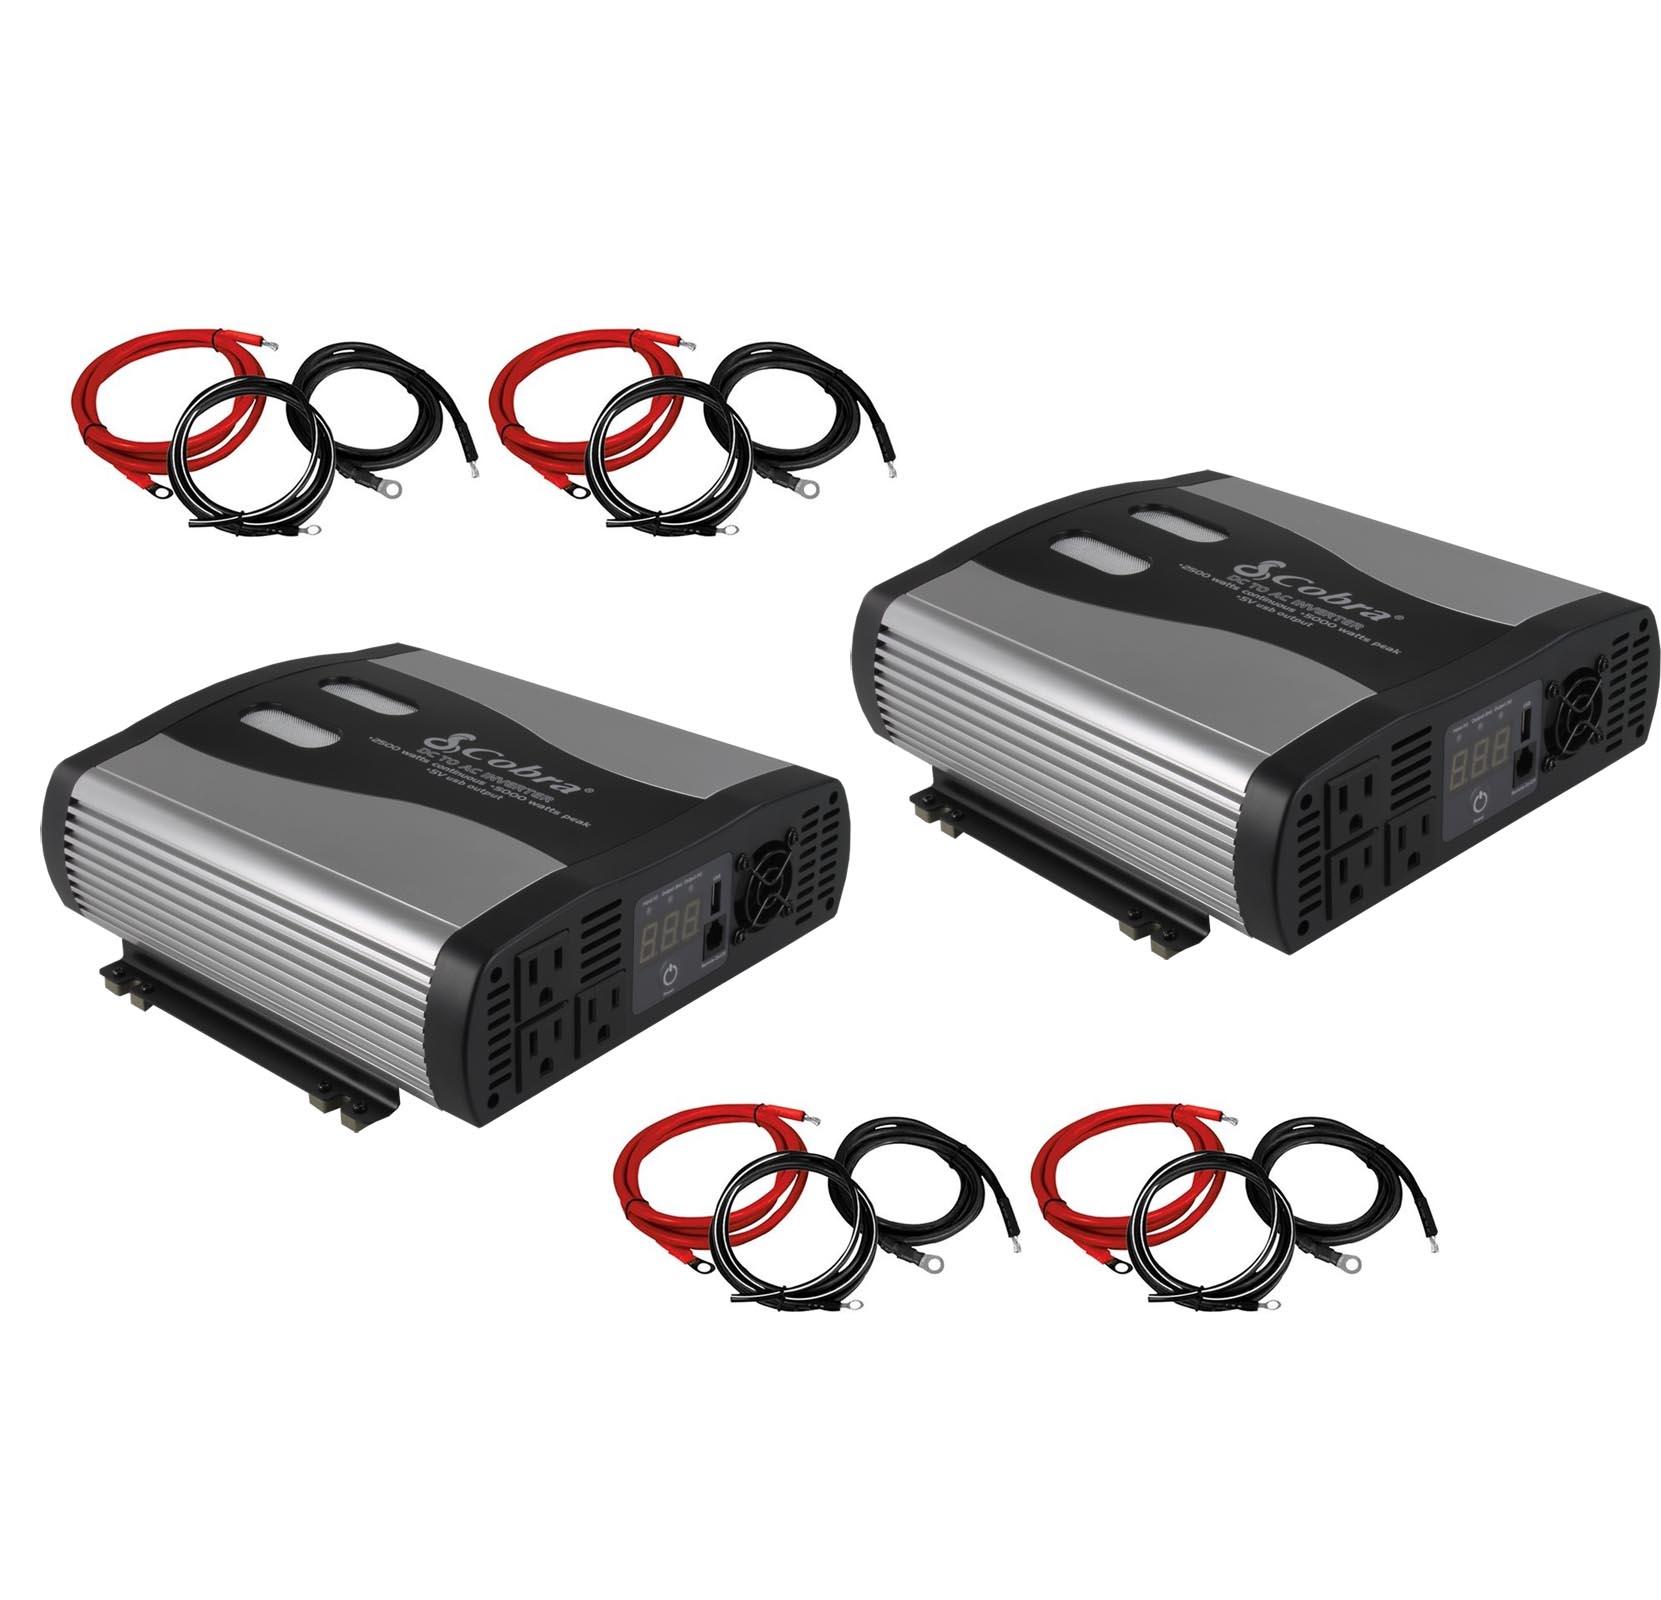 (2) Cobra CPI2575 2500 Watt DC to AC Car Power Inverters ...